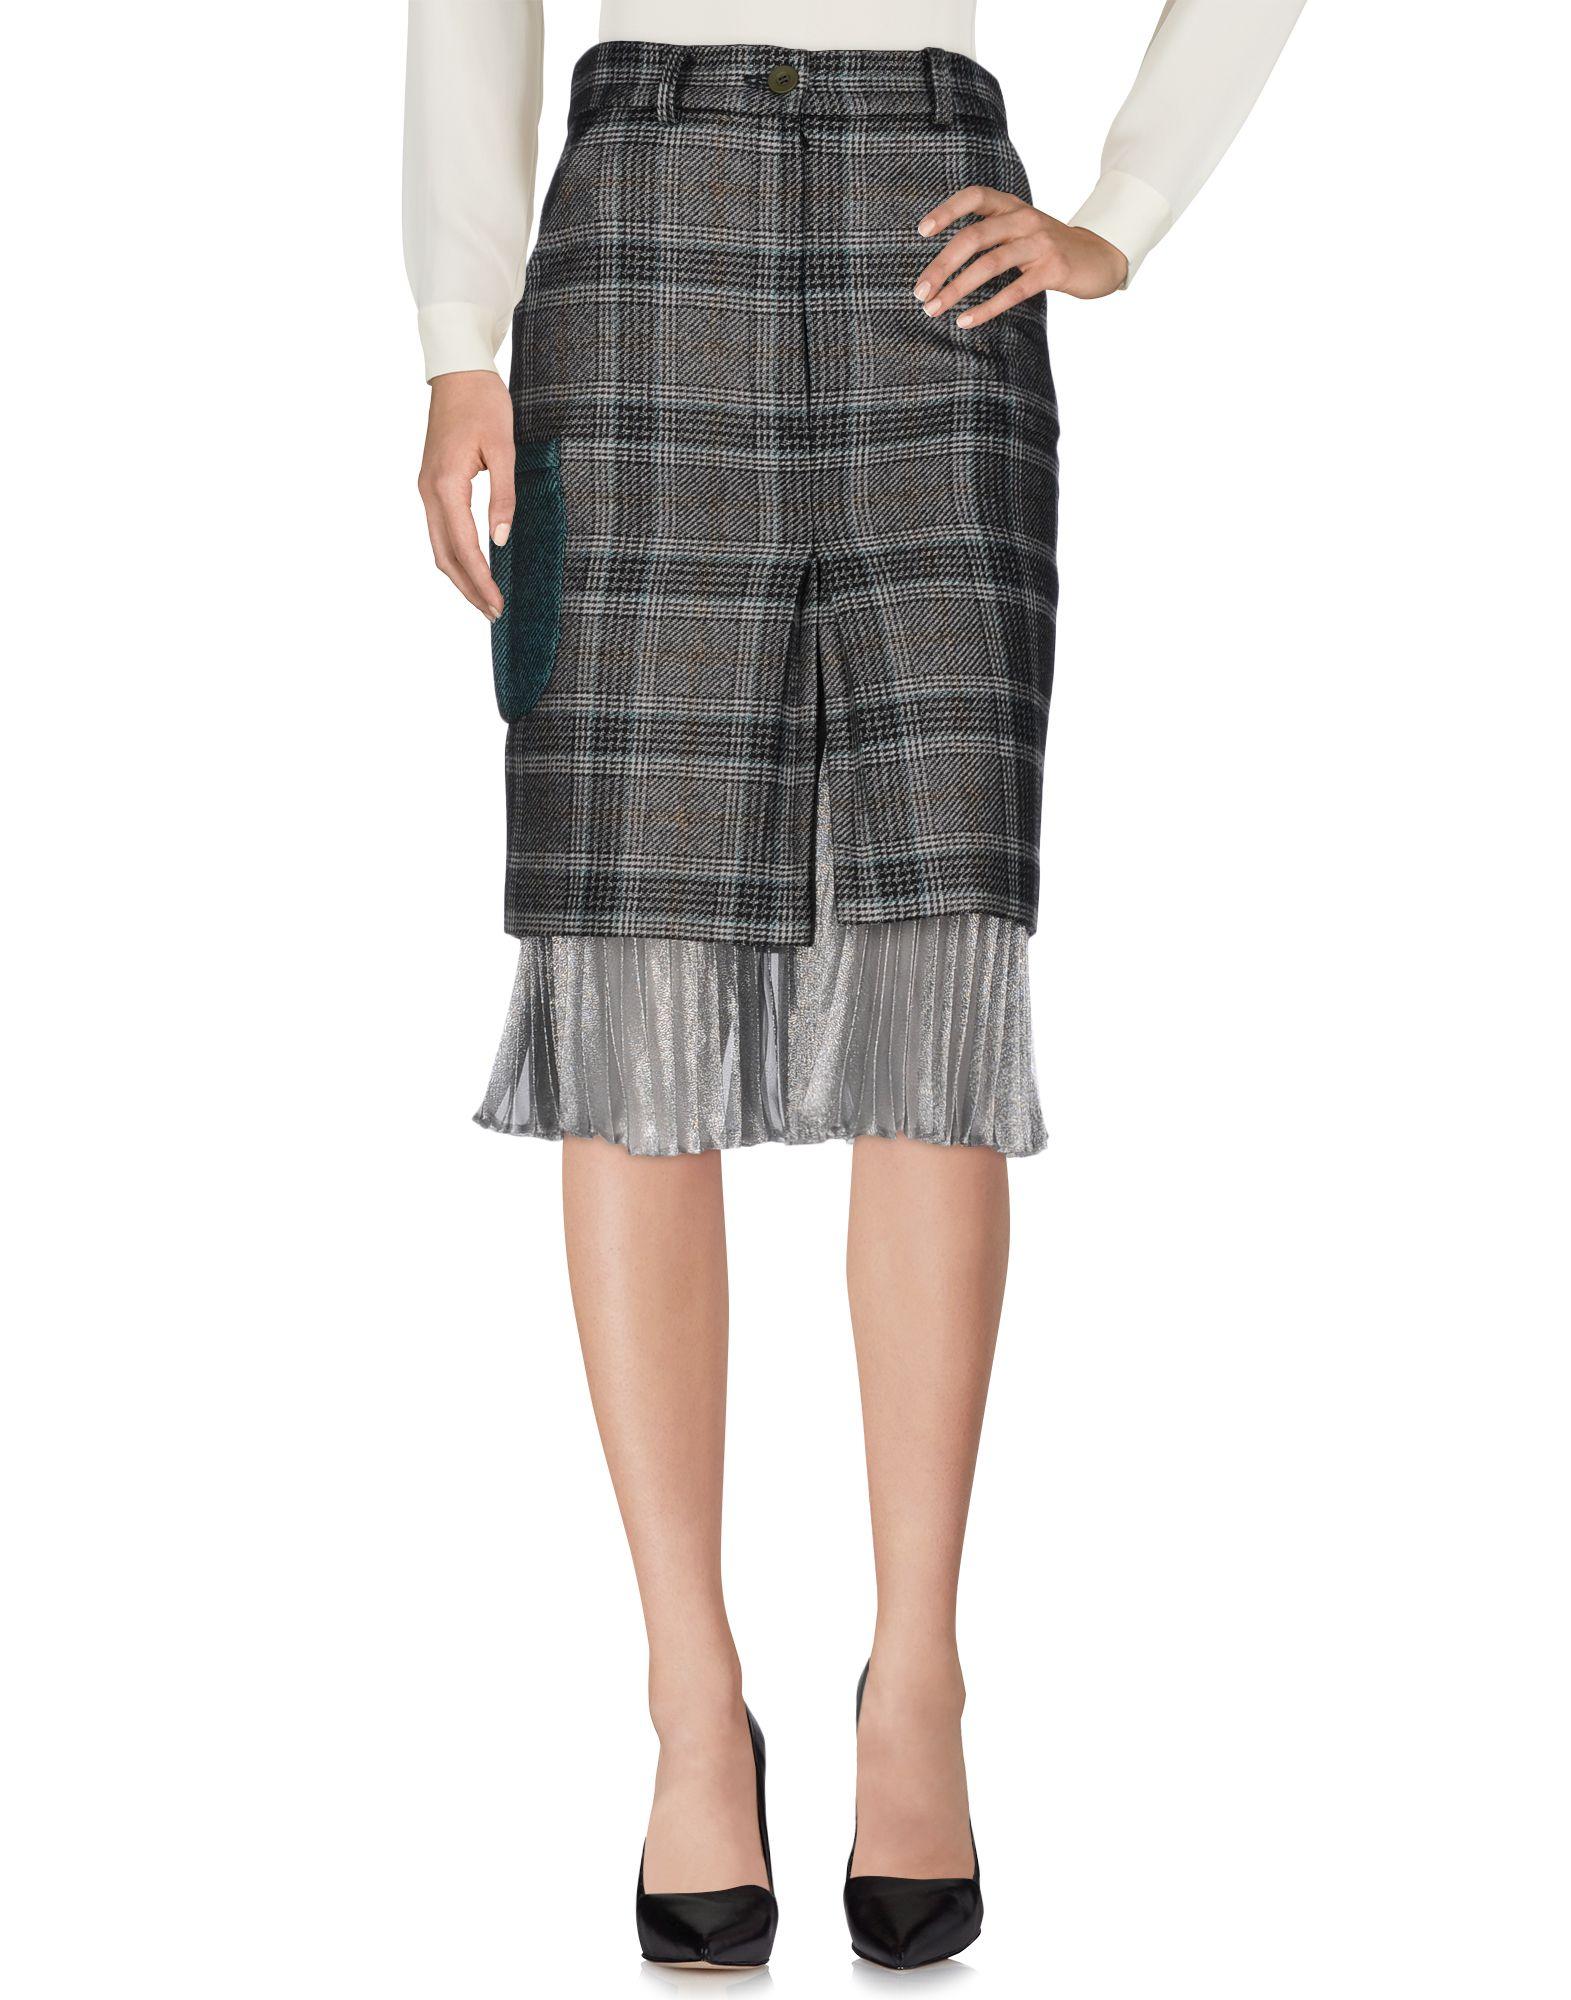 DAIZY SHELY Midi Skirts in Grey